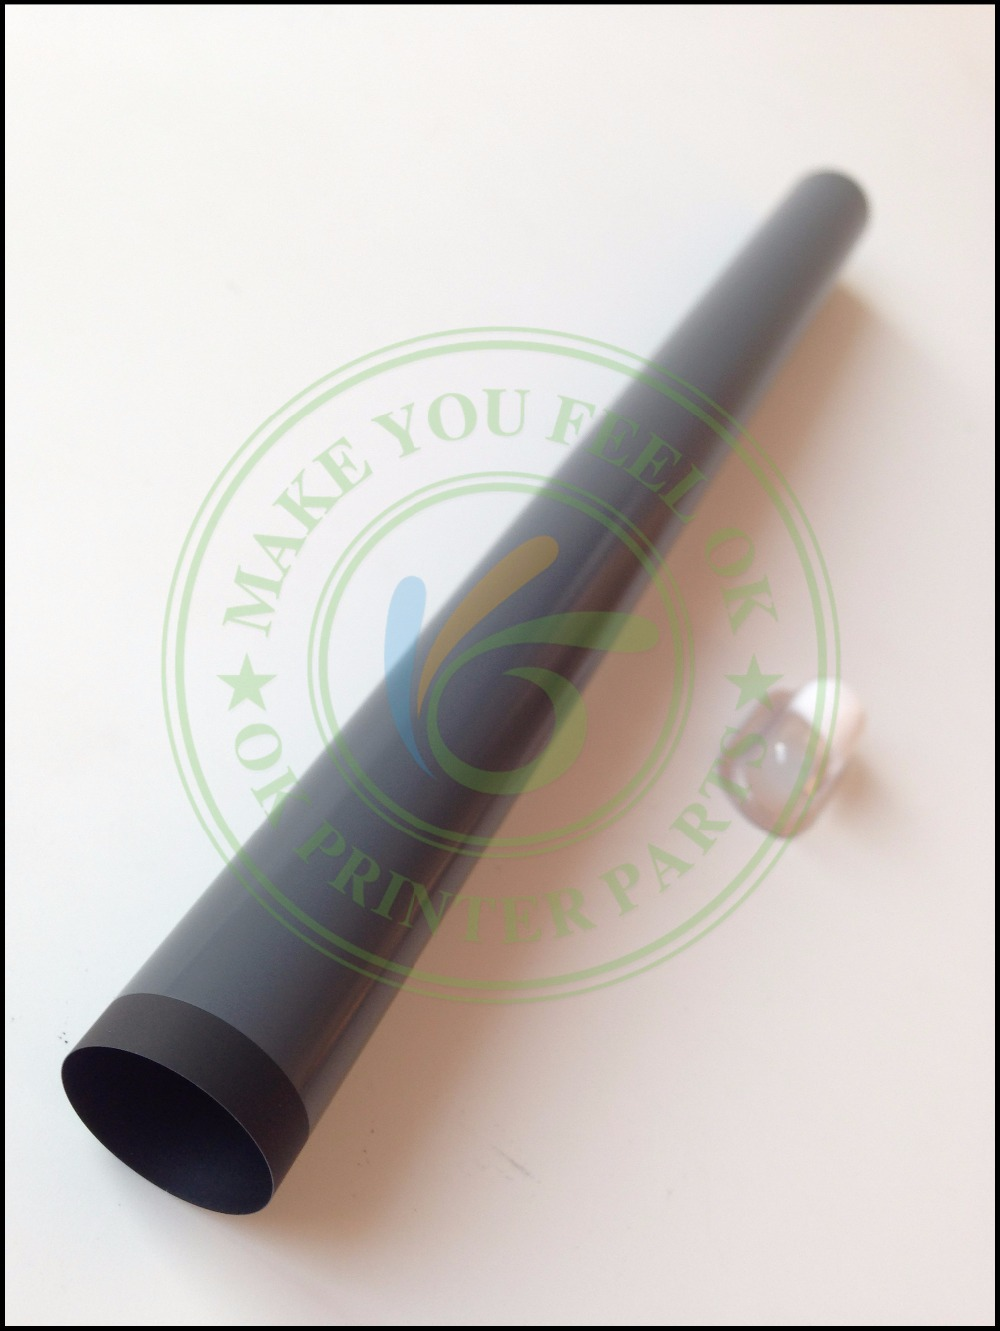 ORIGINAL Fuser film sleeve Fixing Film Sleeve Teflon + grease for HP P2035 P2055 P2030 P2050 M2727 P2014 Pro 400 M400 M401 M425(China (Mainland))